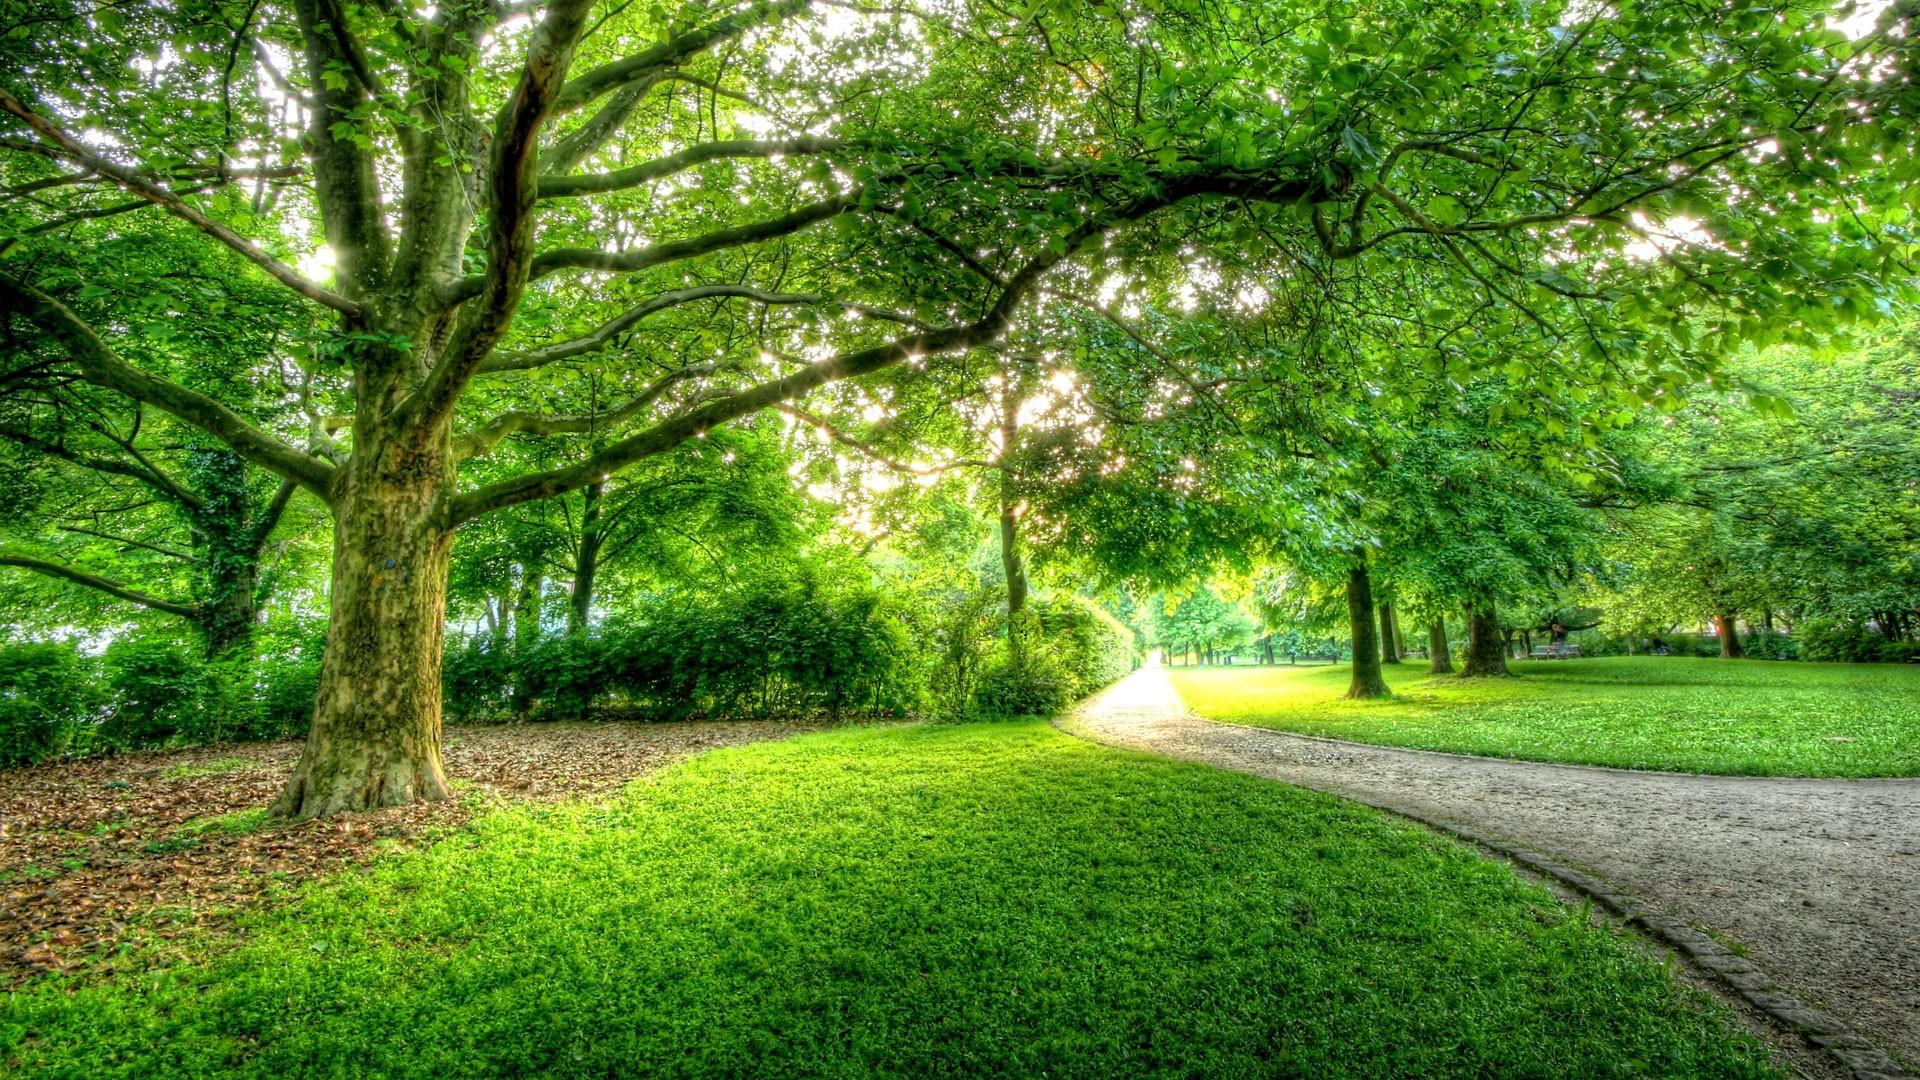 Fondo Animado Campo Parque Full Hd Animate Background: Green Trees Berlin Park Wallpaper